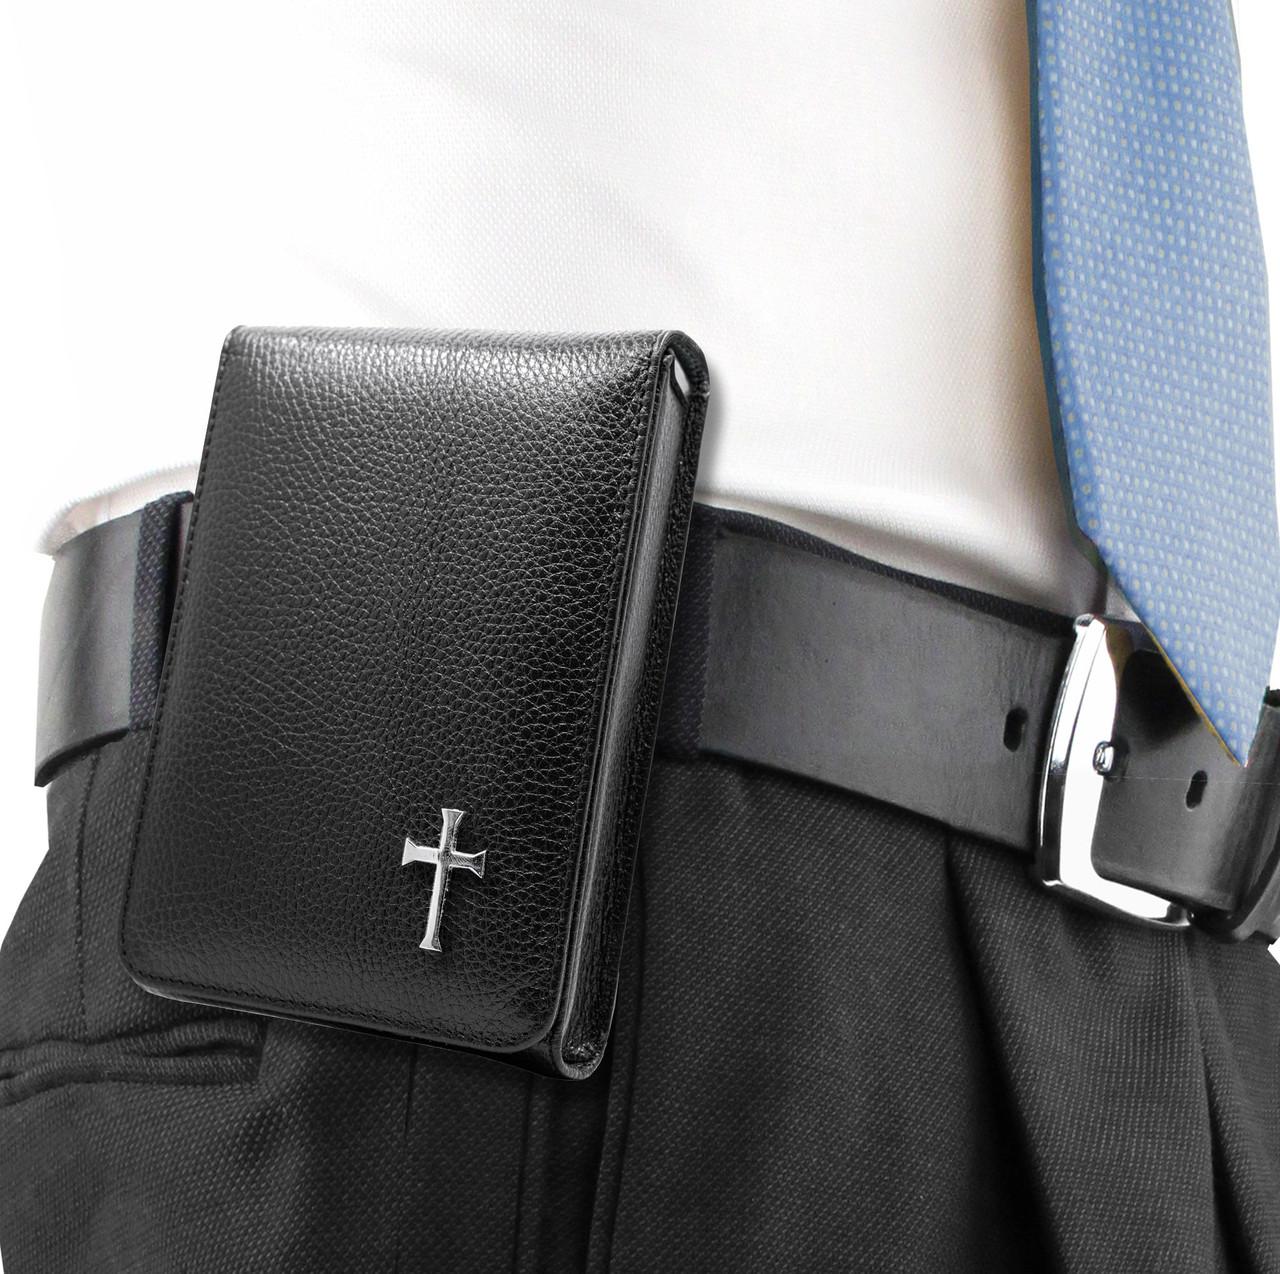 Glock 19X Black Leather Cross Series Holster